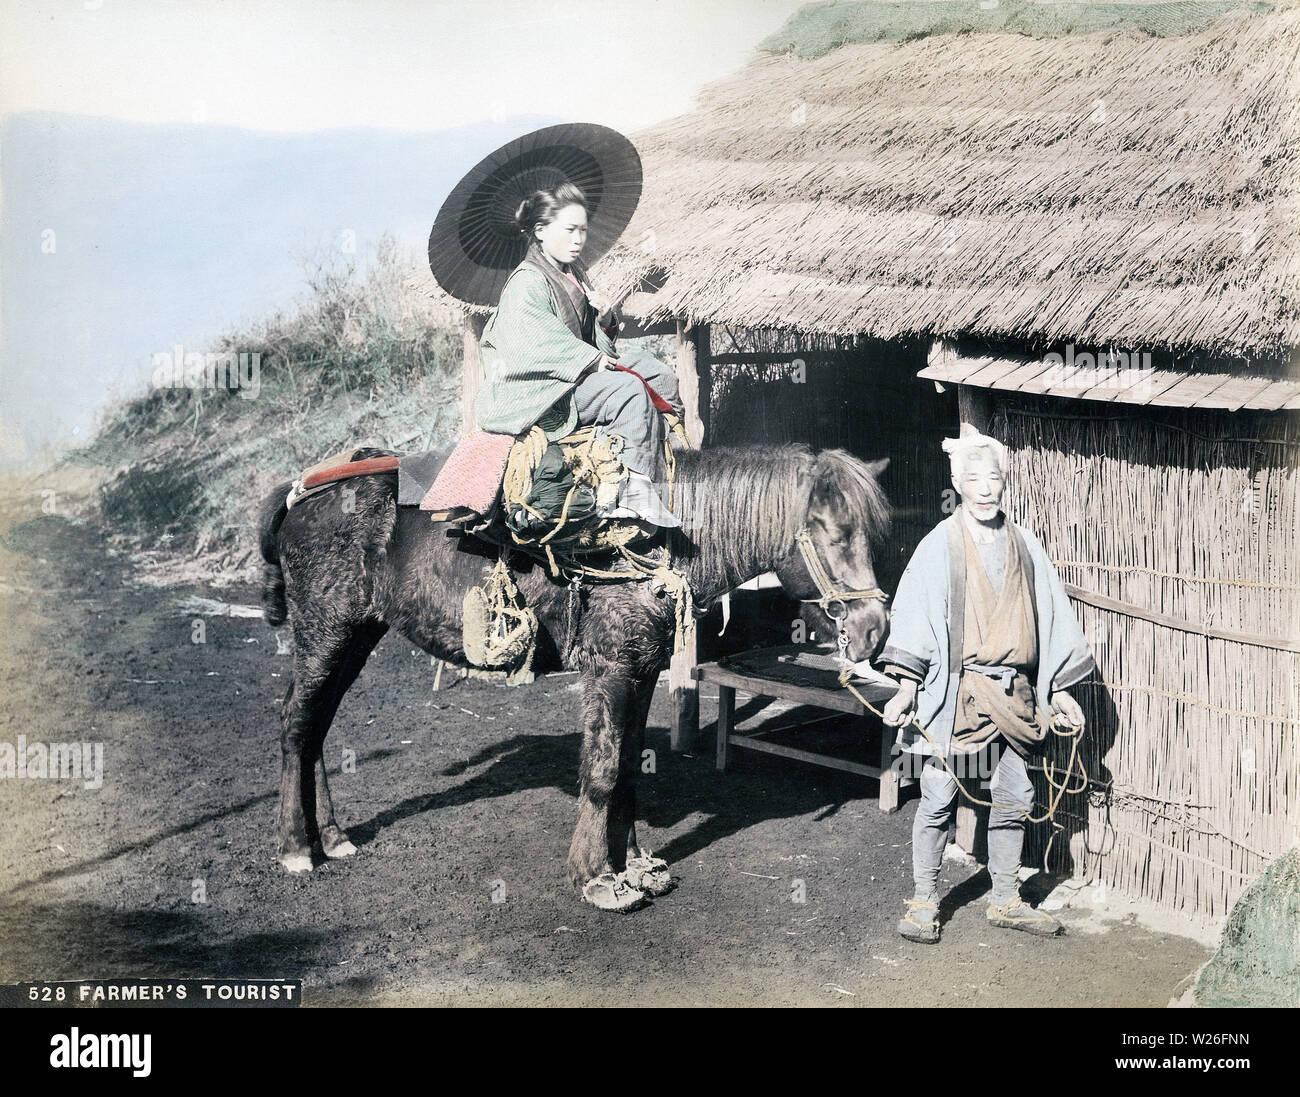 Gedeckt frau vom pferd Wyatt Earp